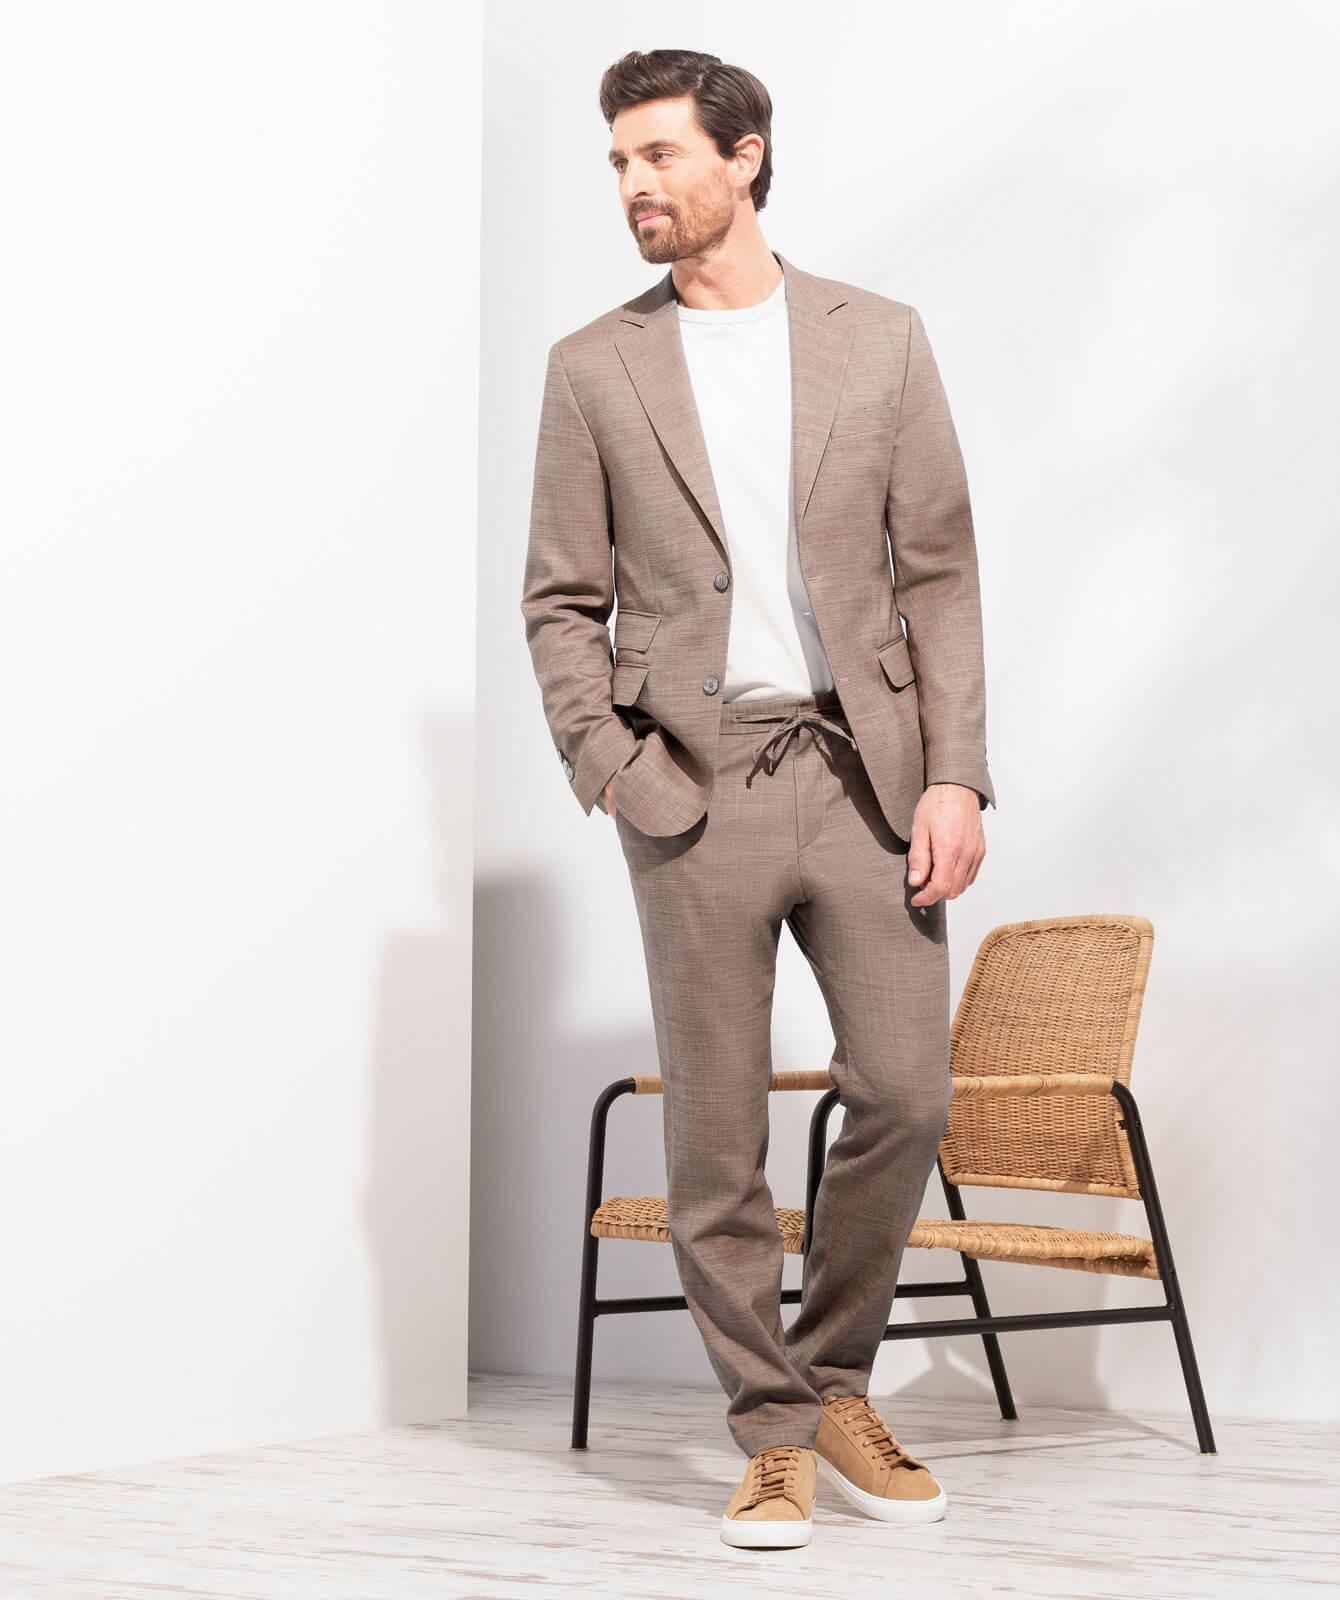 Brauner Komfort-Anzug aus JEBRIC